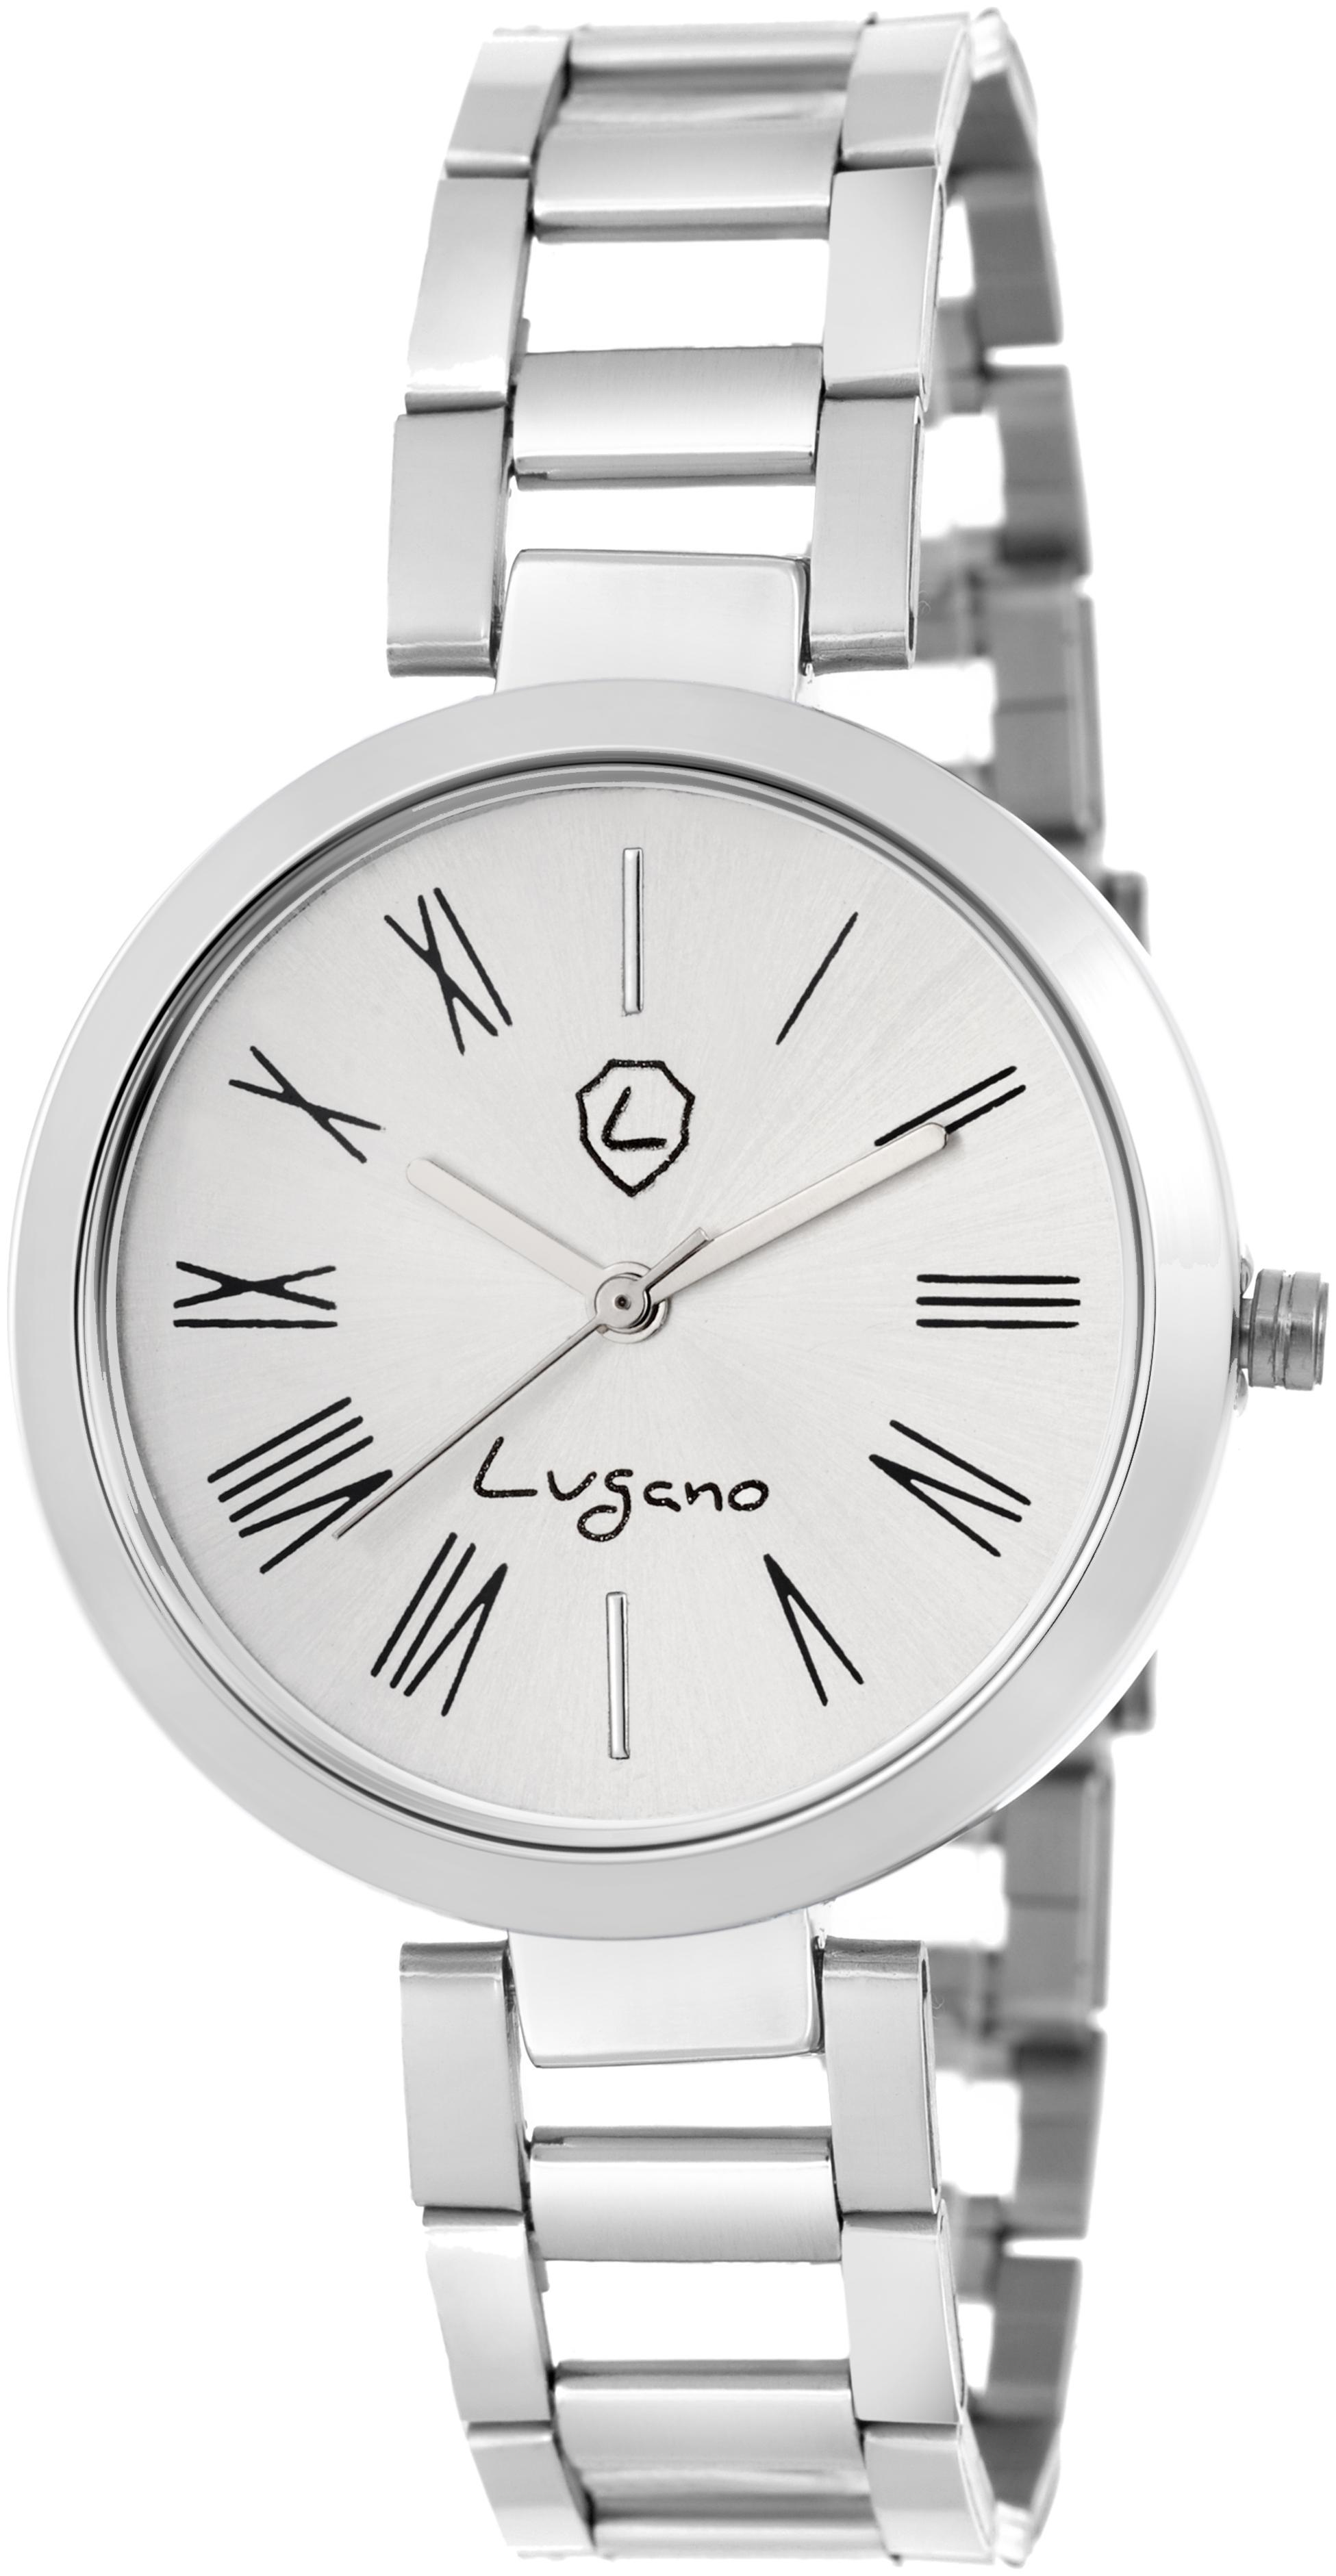 lugano LG 2041 Women White Analog Watch by Disha Enterprises